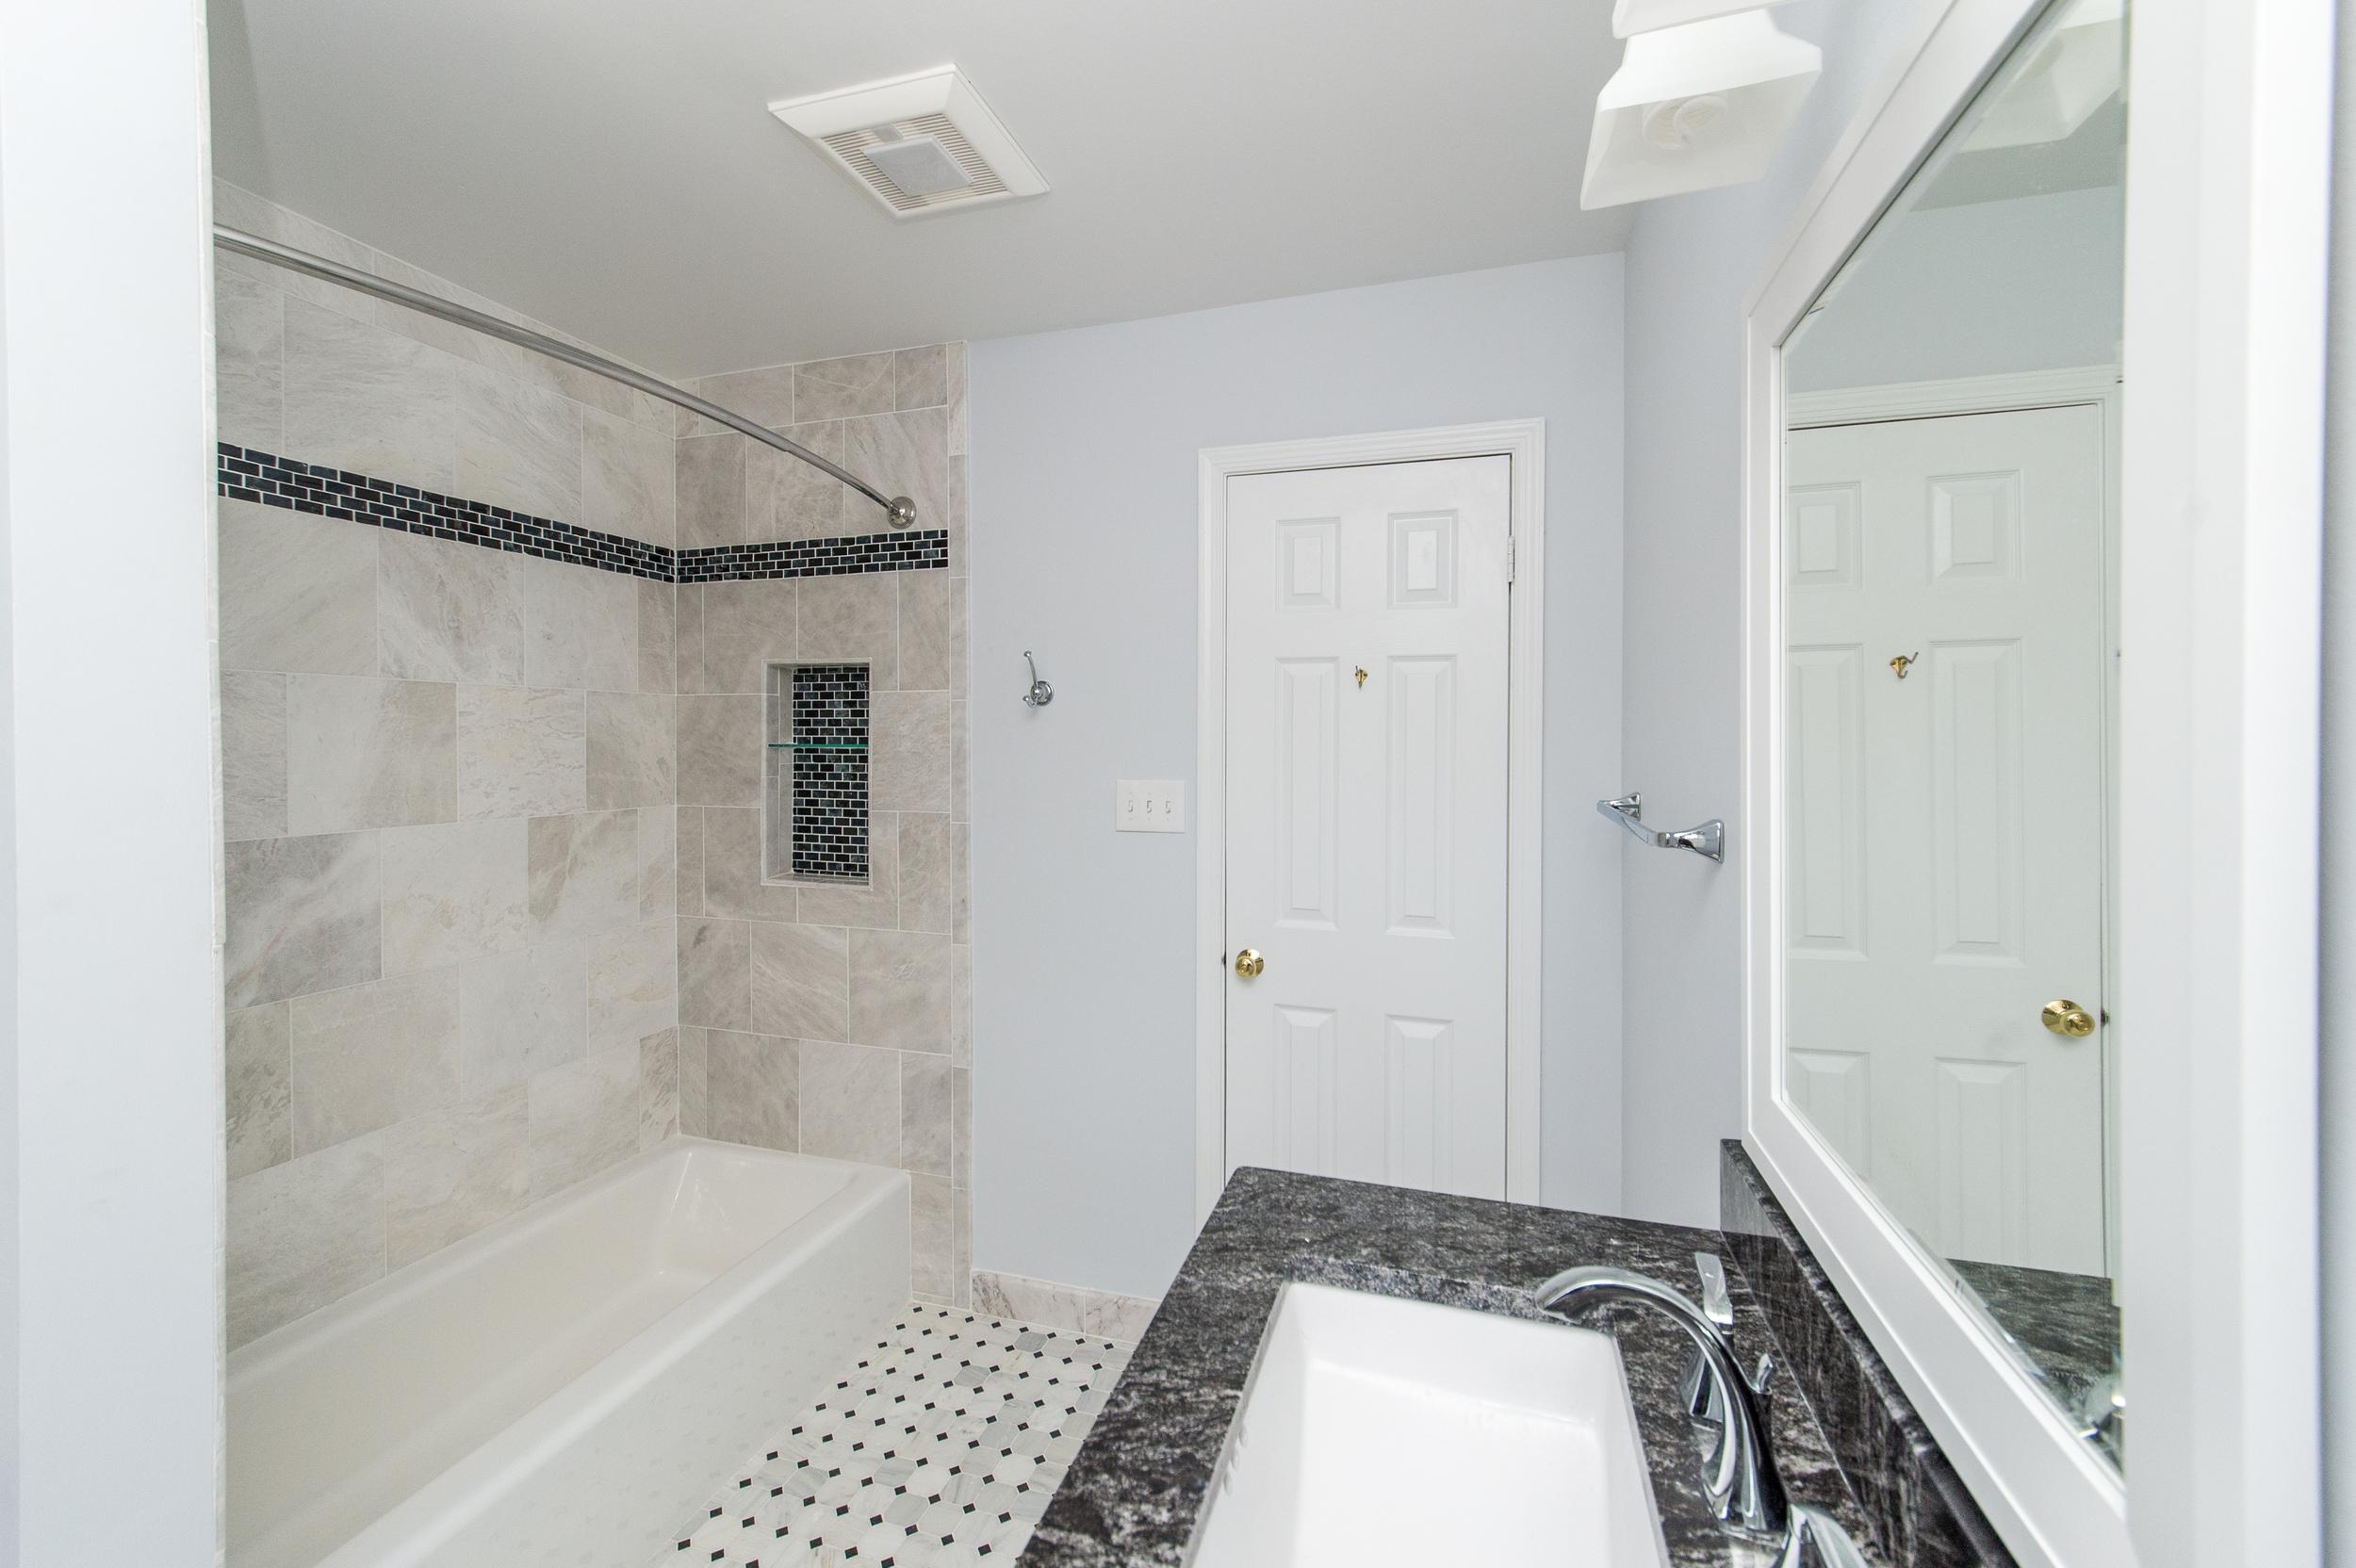 Bathroom Remodeling Maryland gvidui -bathroom remodeling — euro design remodel - remodeler with